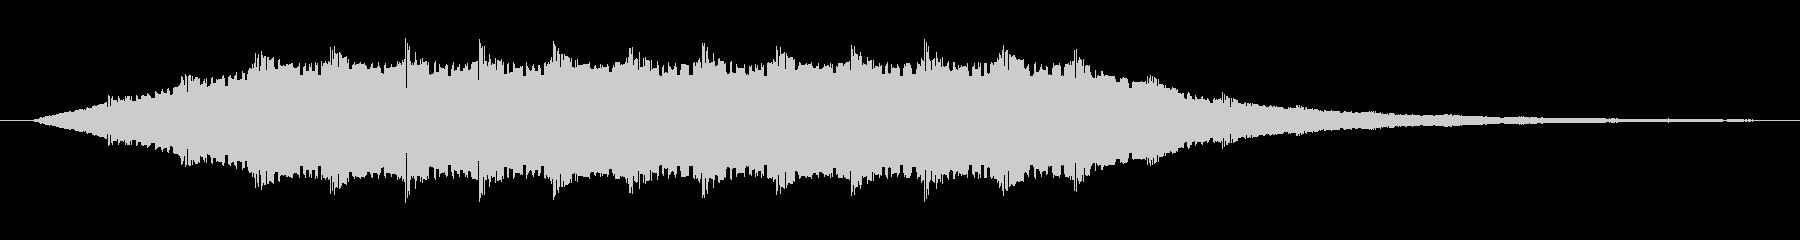 Tone Modulation 8...の未再生の波形